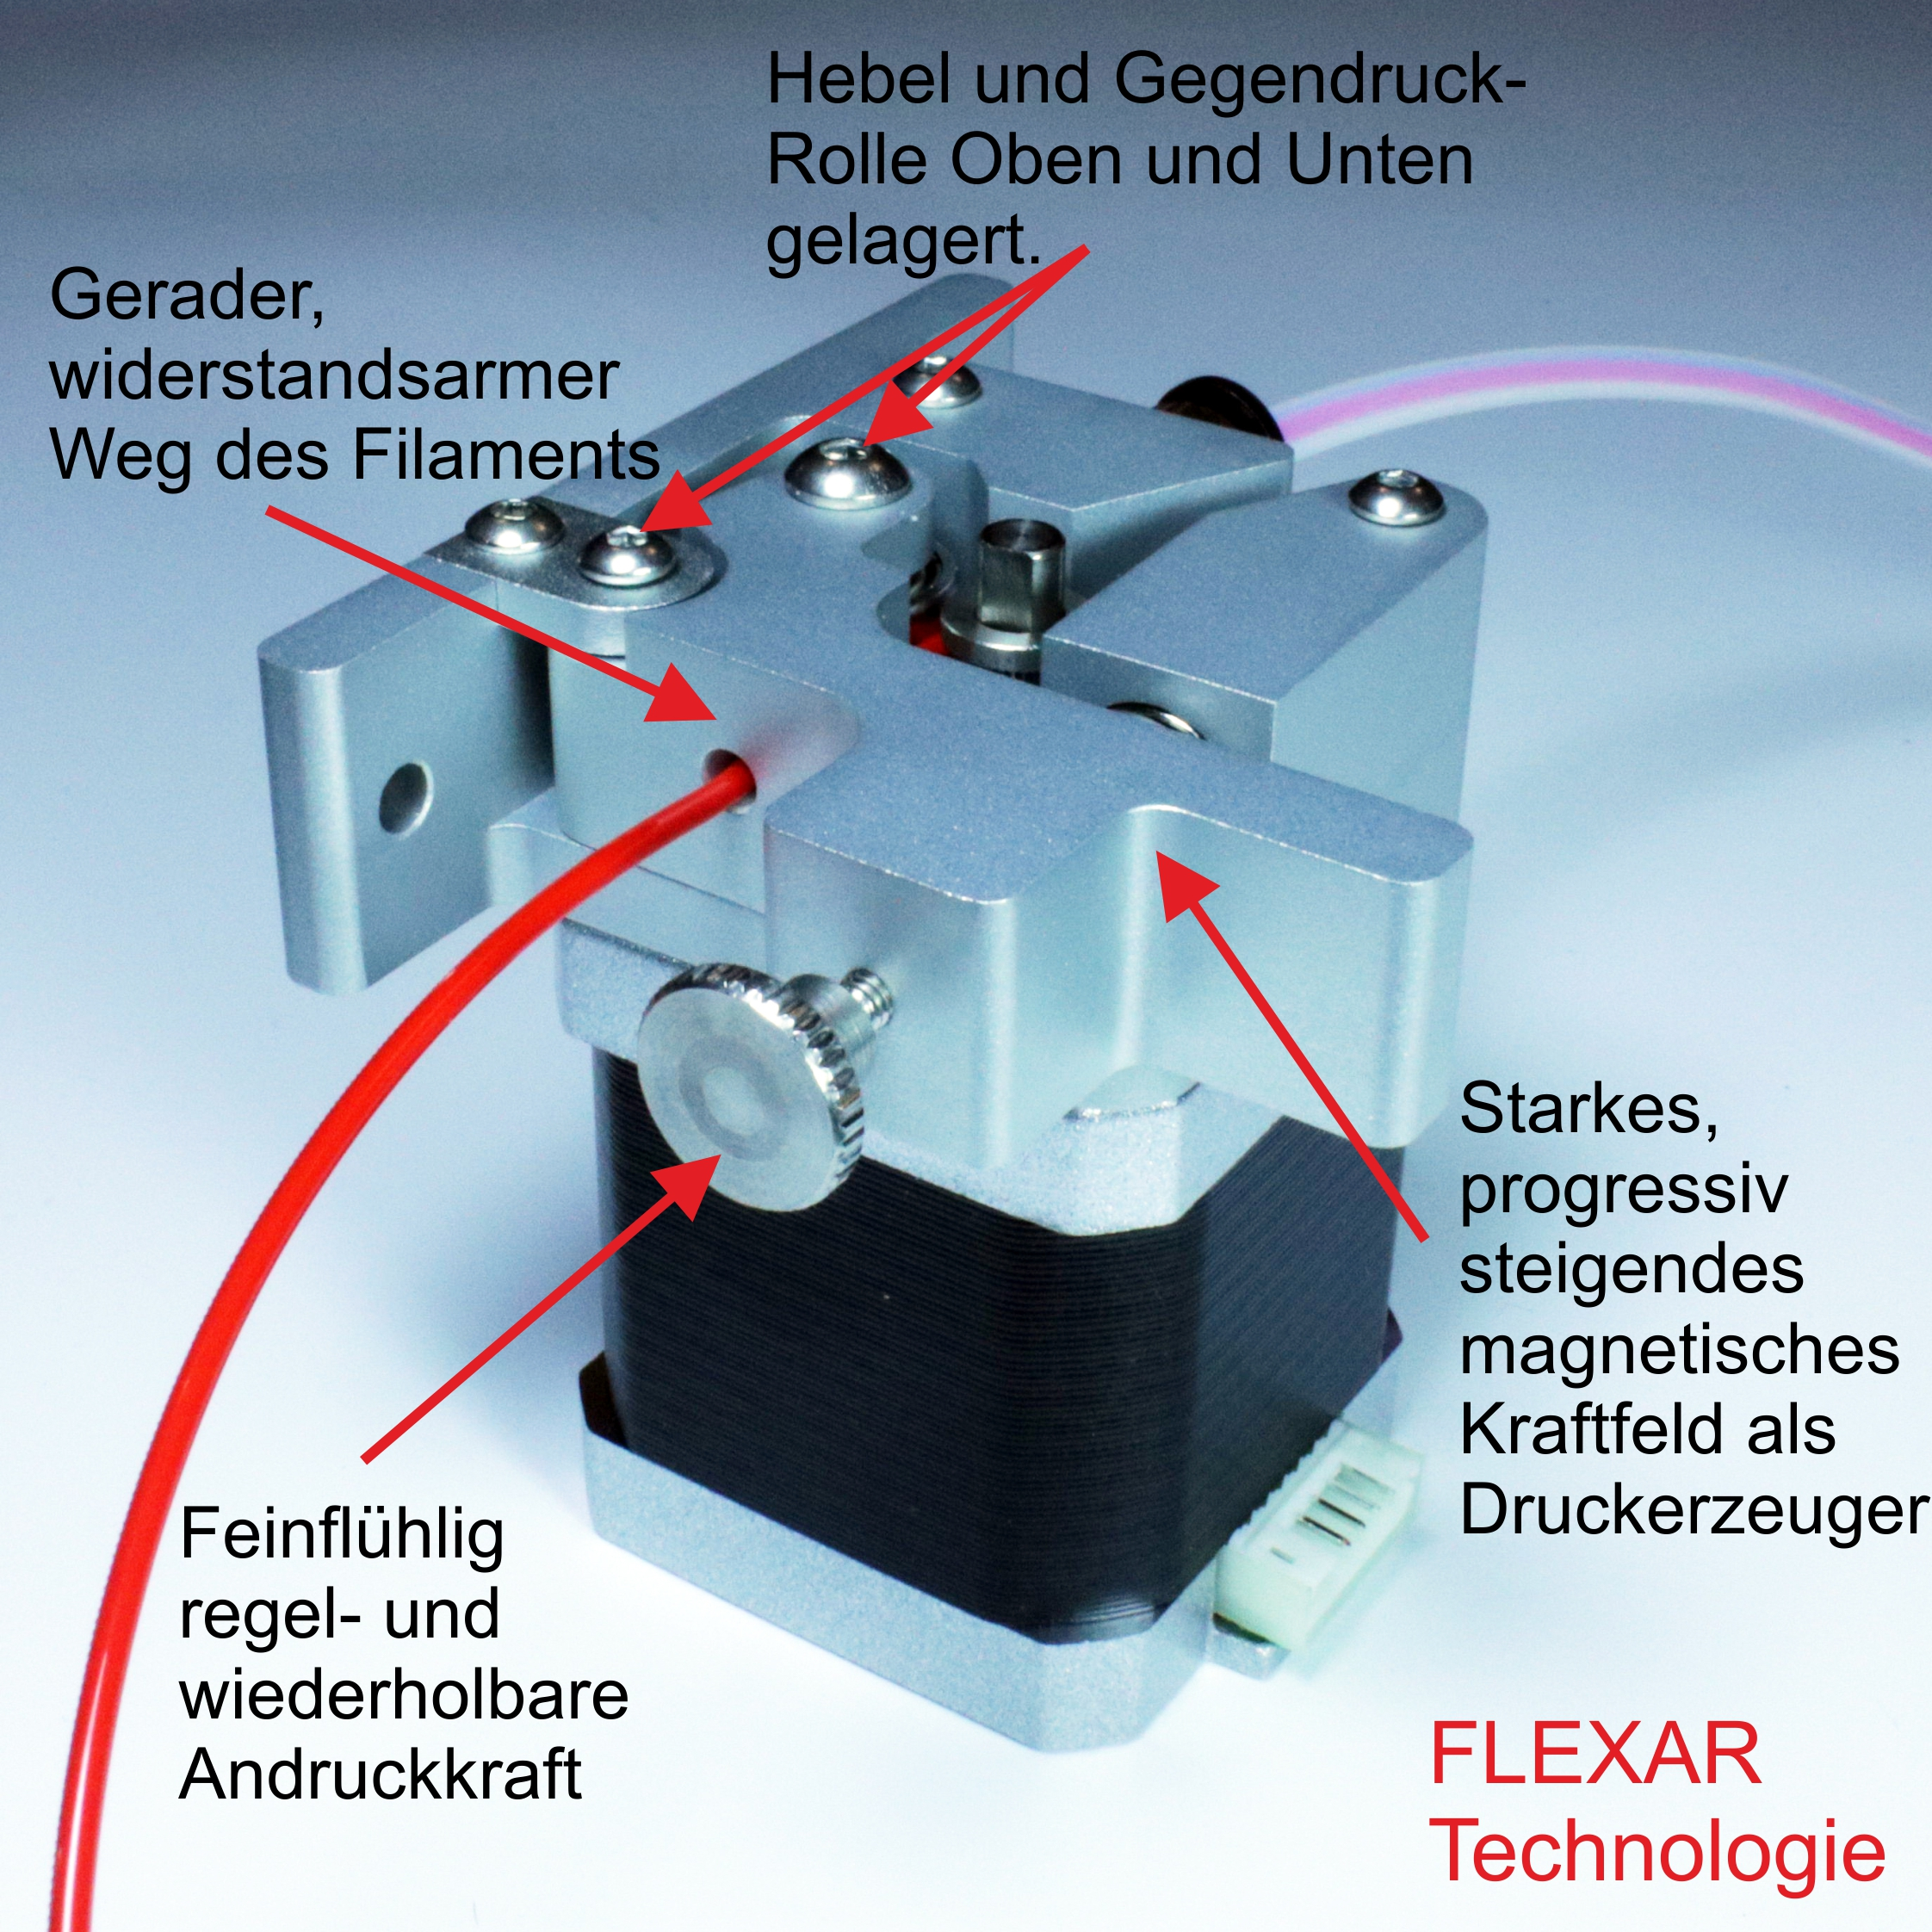 magnetic-alu-flexar-extruder-erklaerung-2